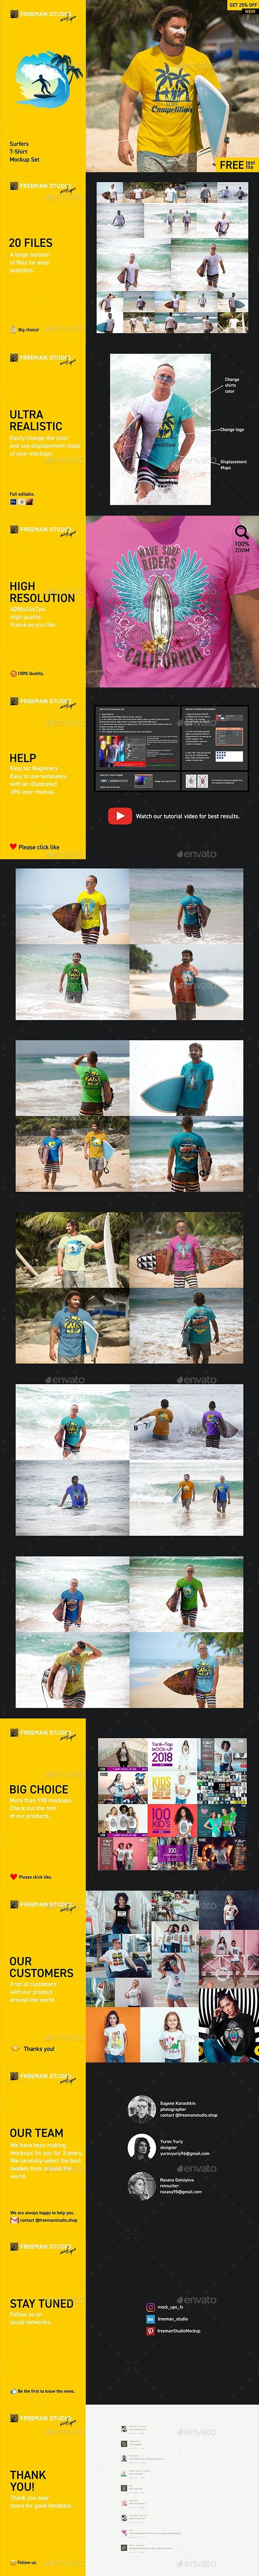 Surfers T-Shirt Mock-Up Set - Product Mock-Ups Graphics